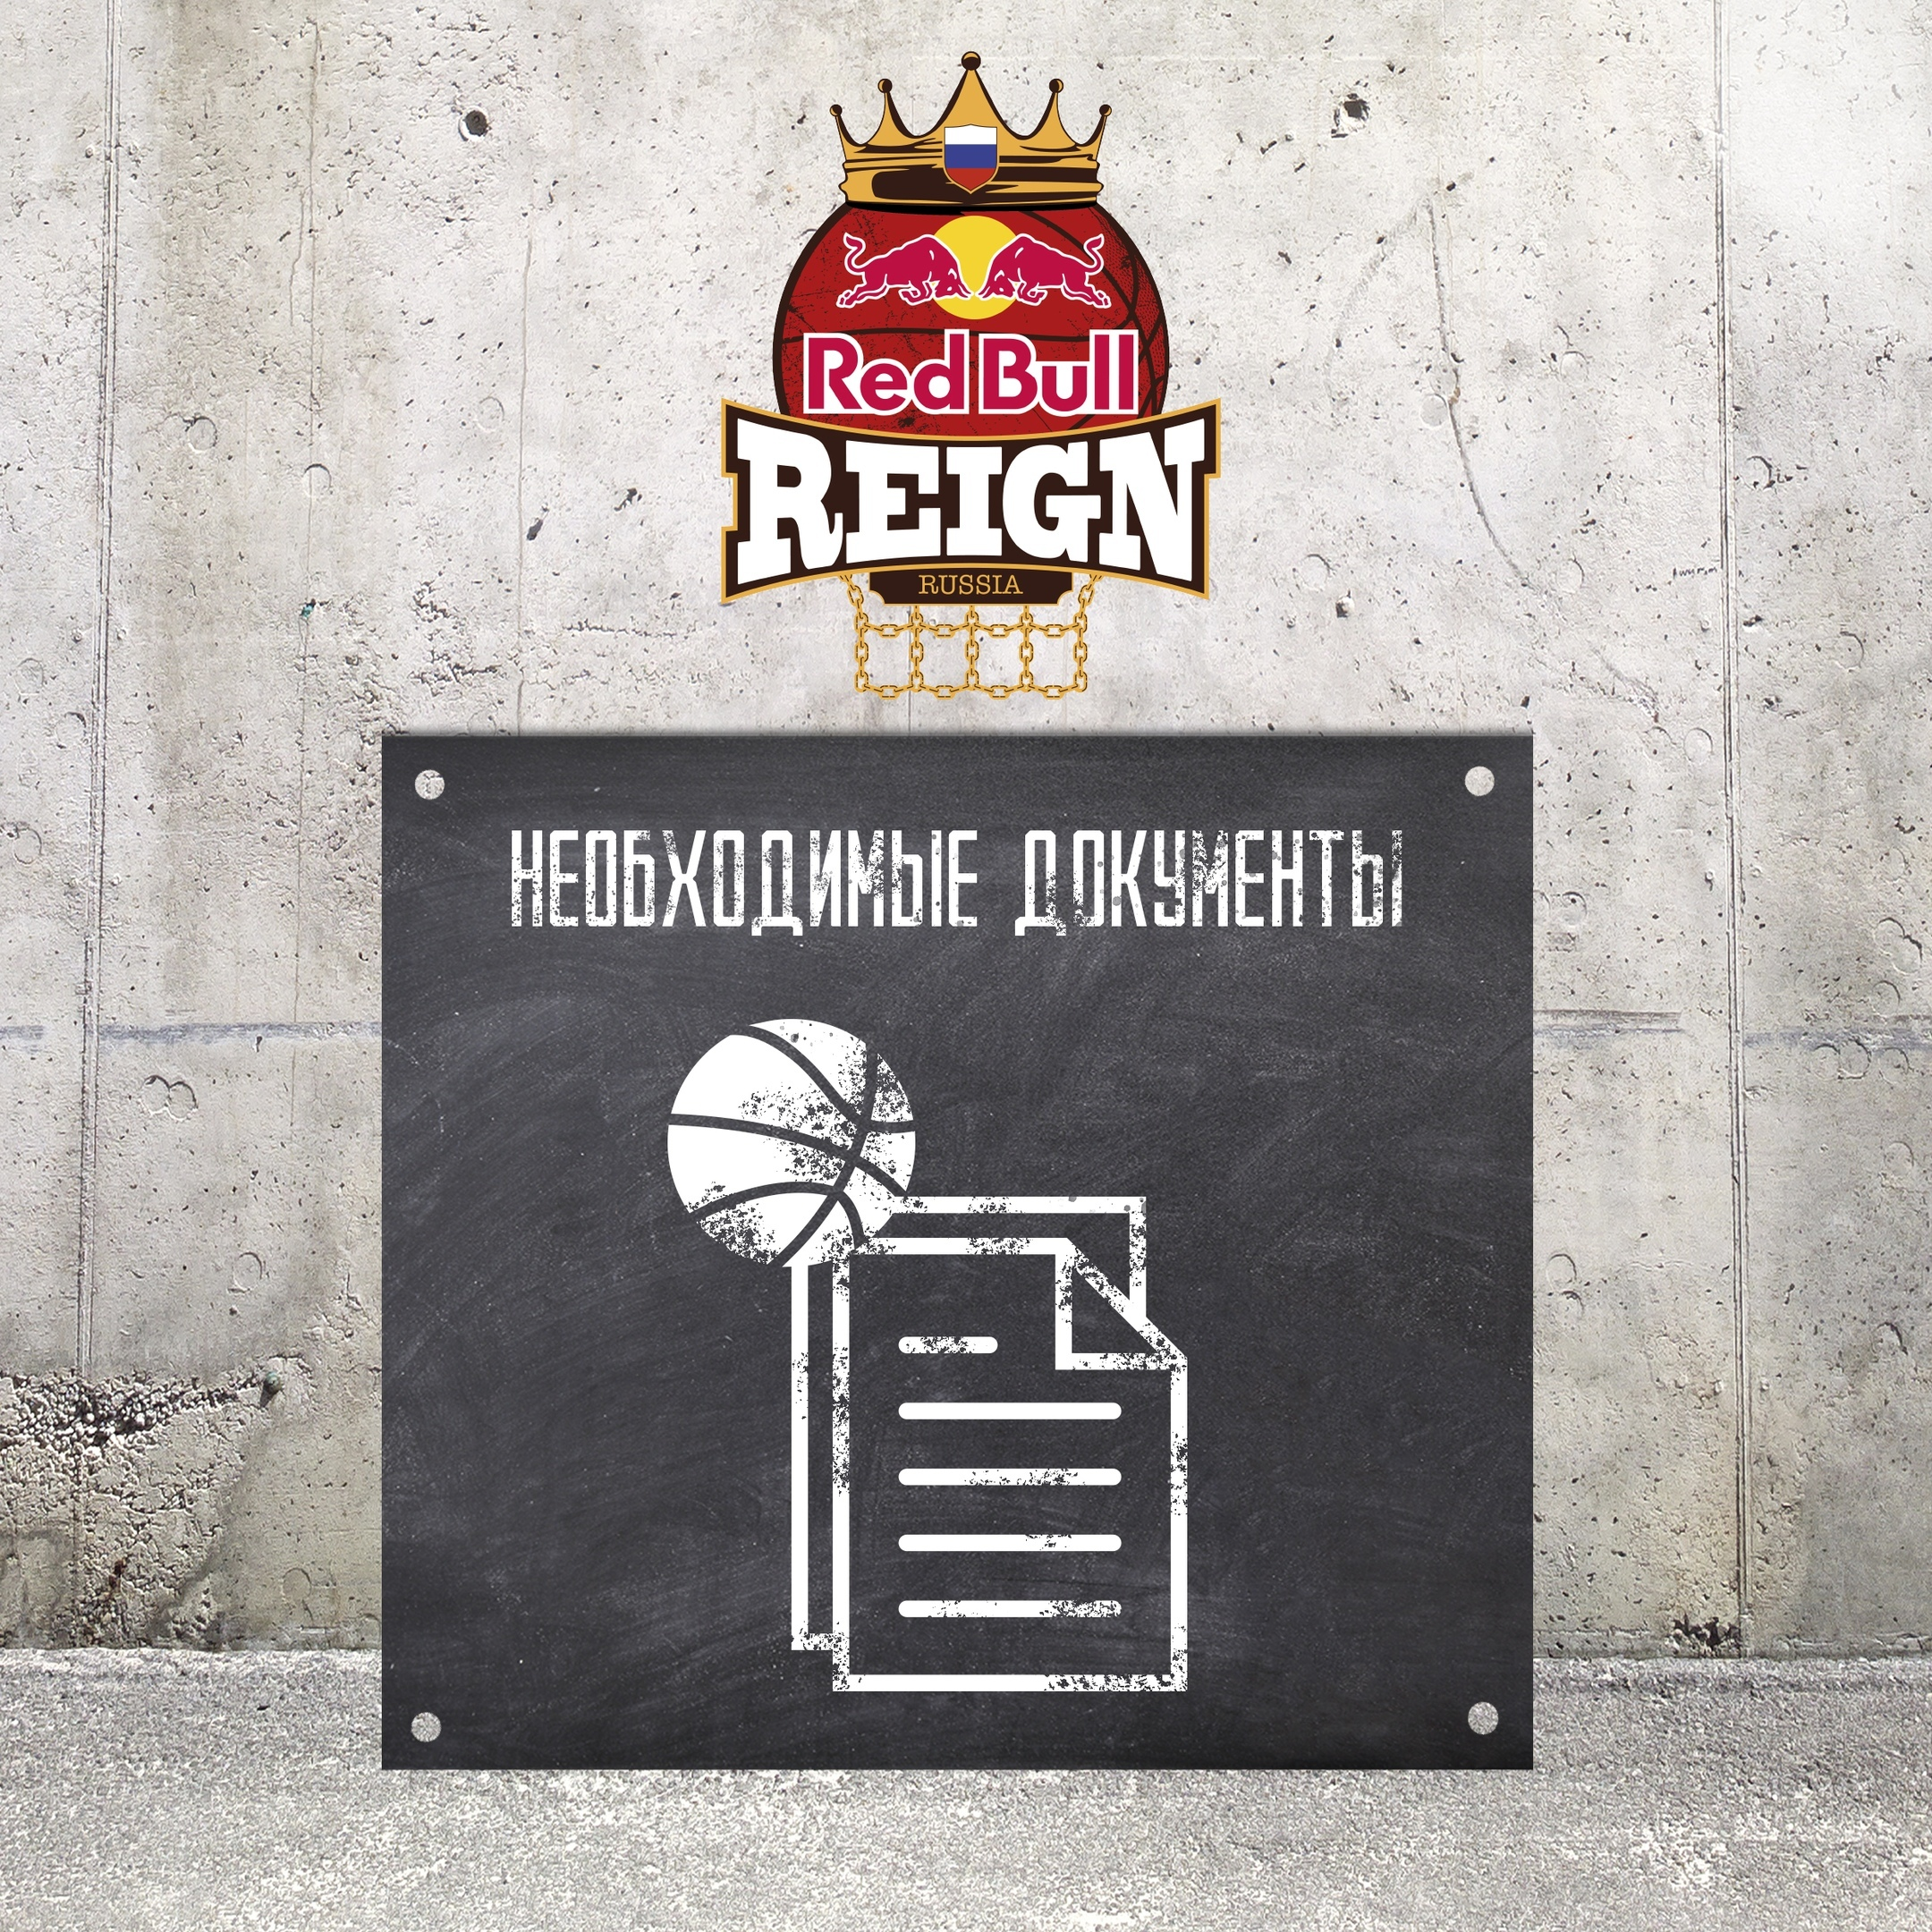 Red Bull Reign 3x3 Краснодар